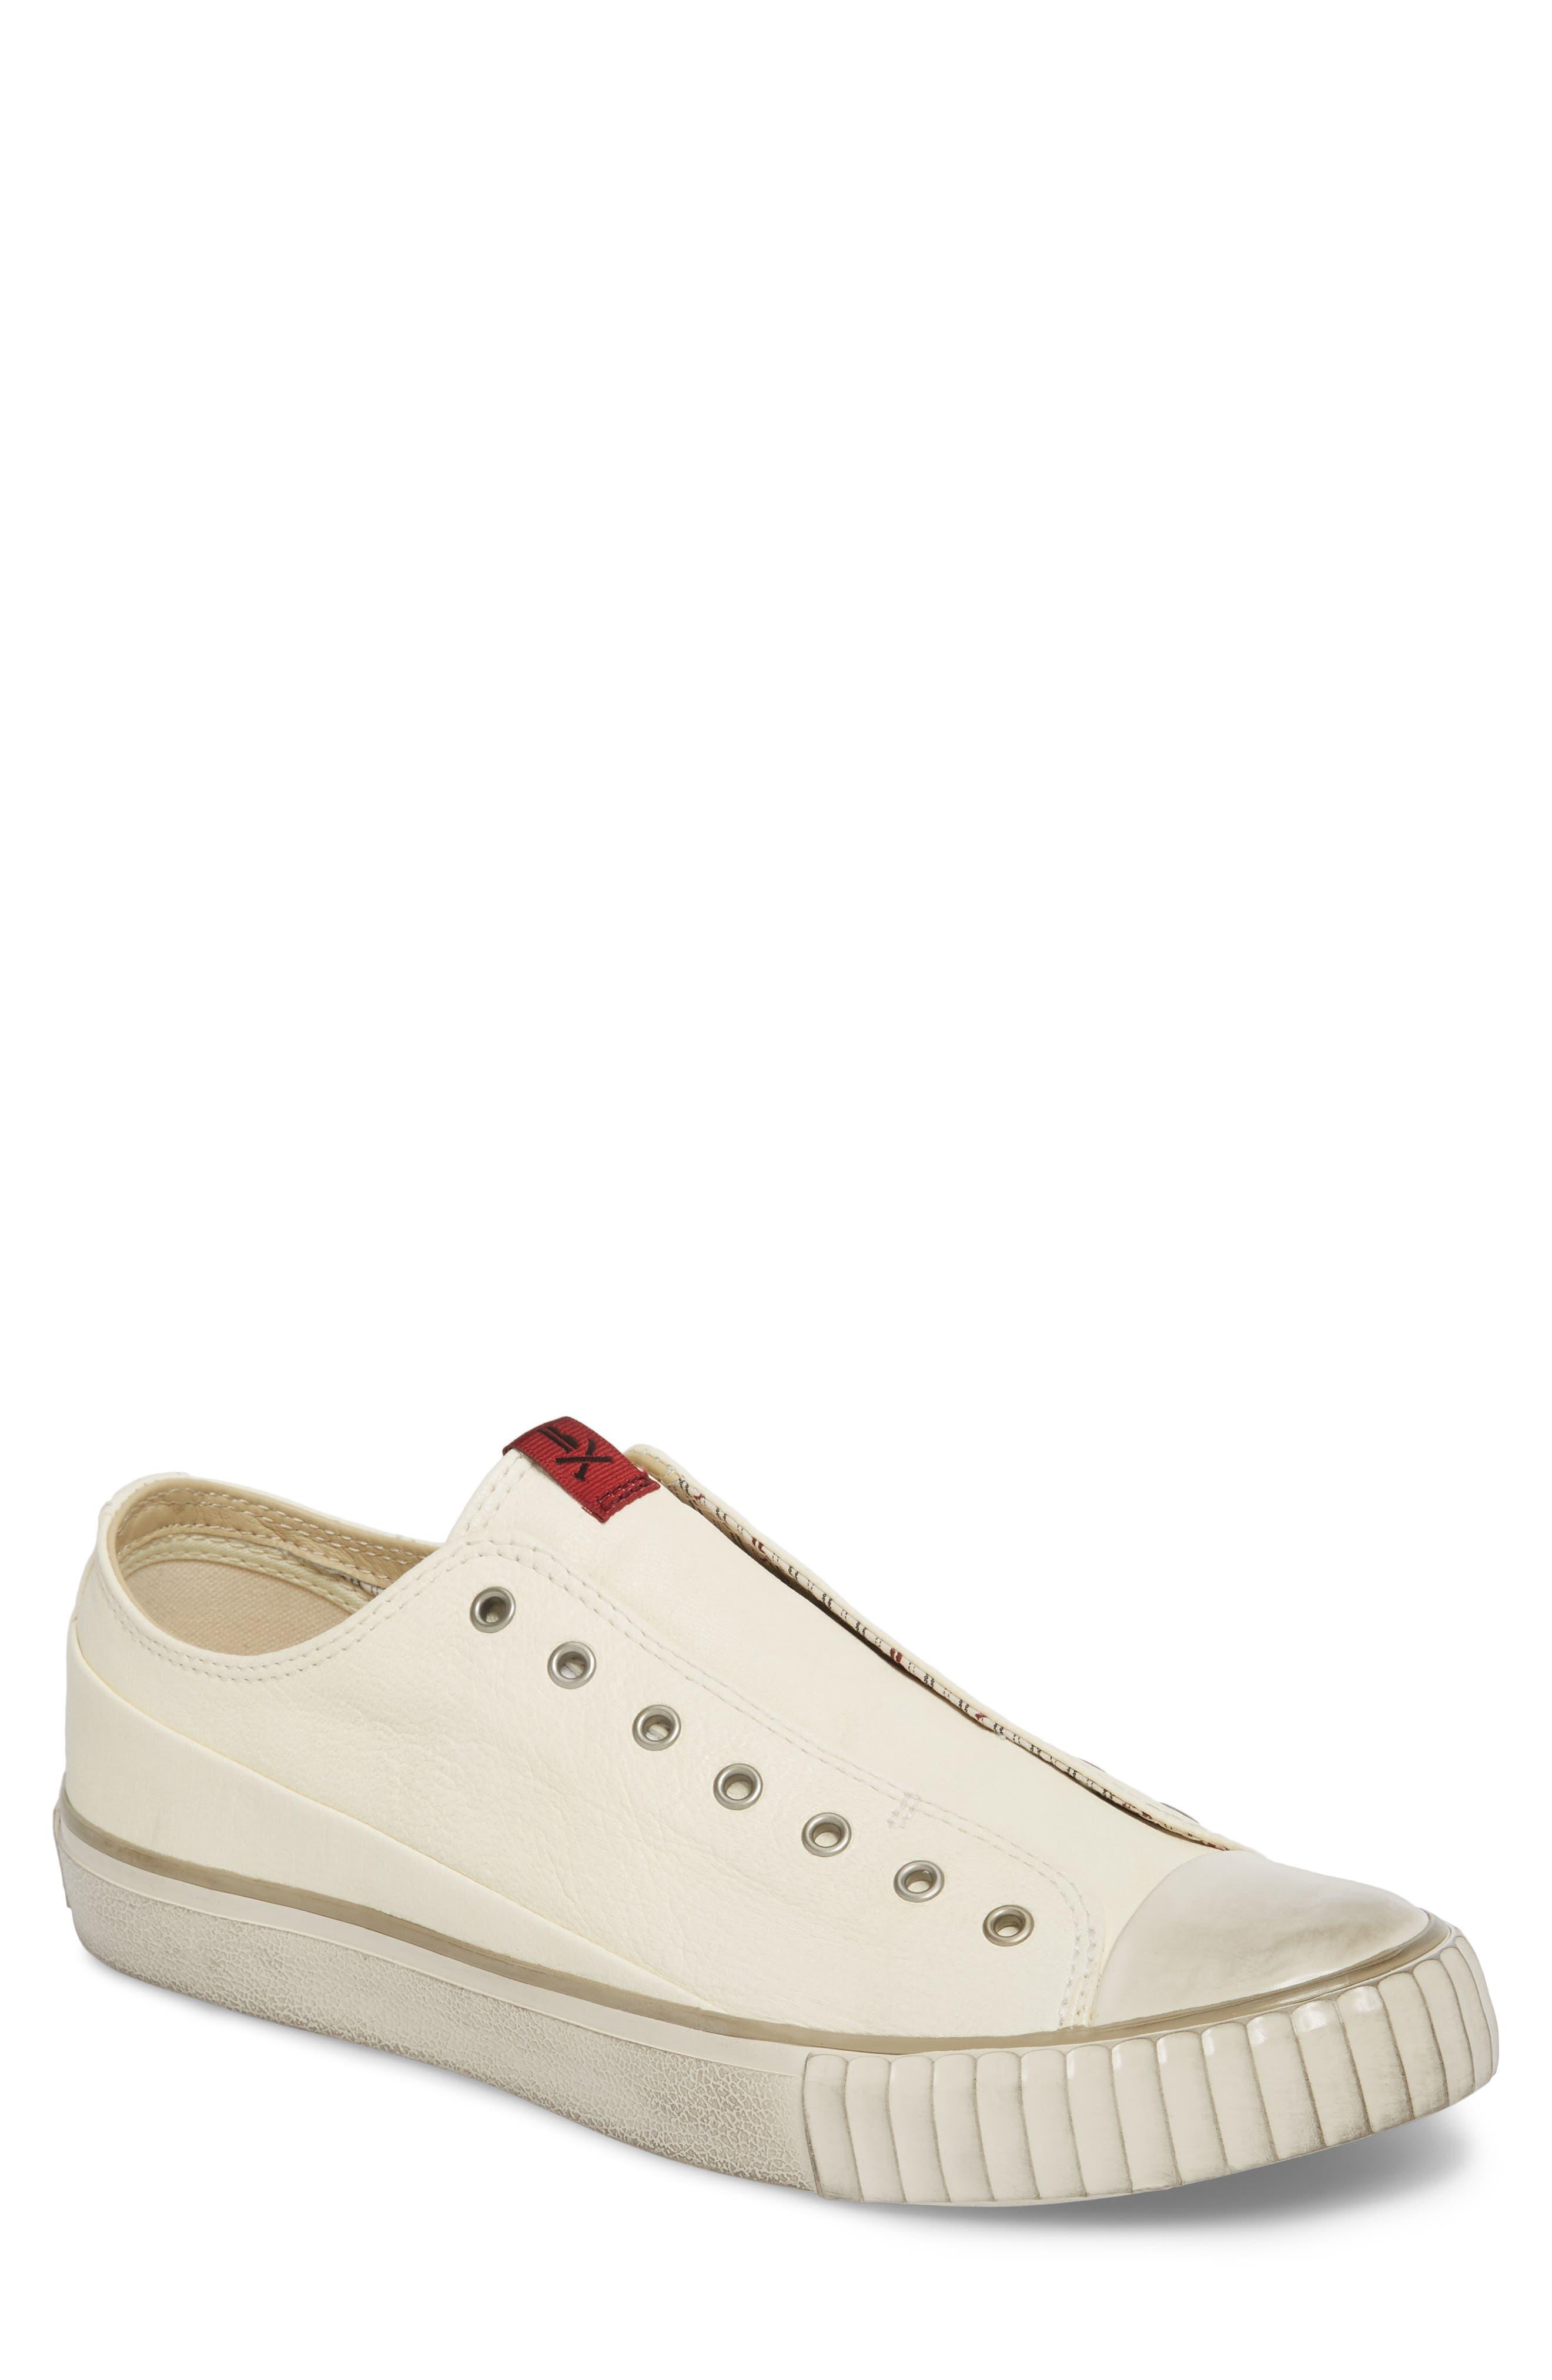 Bootleg By John Varvatos Laceless Low Top Sneaker- White